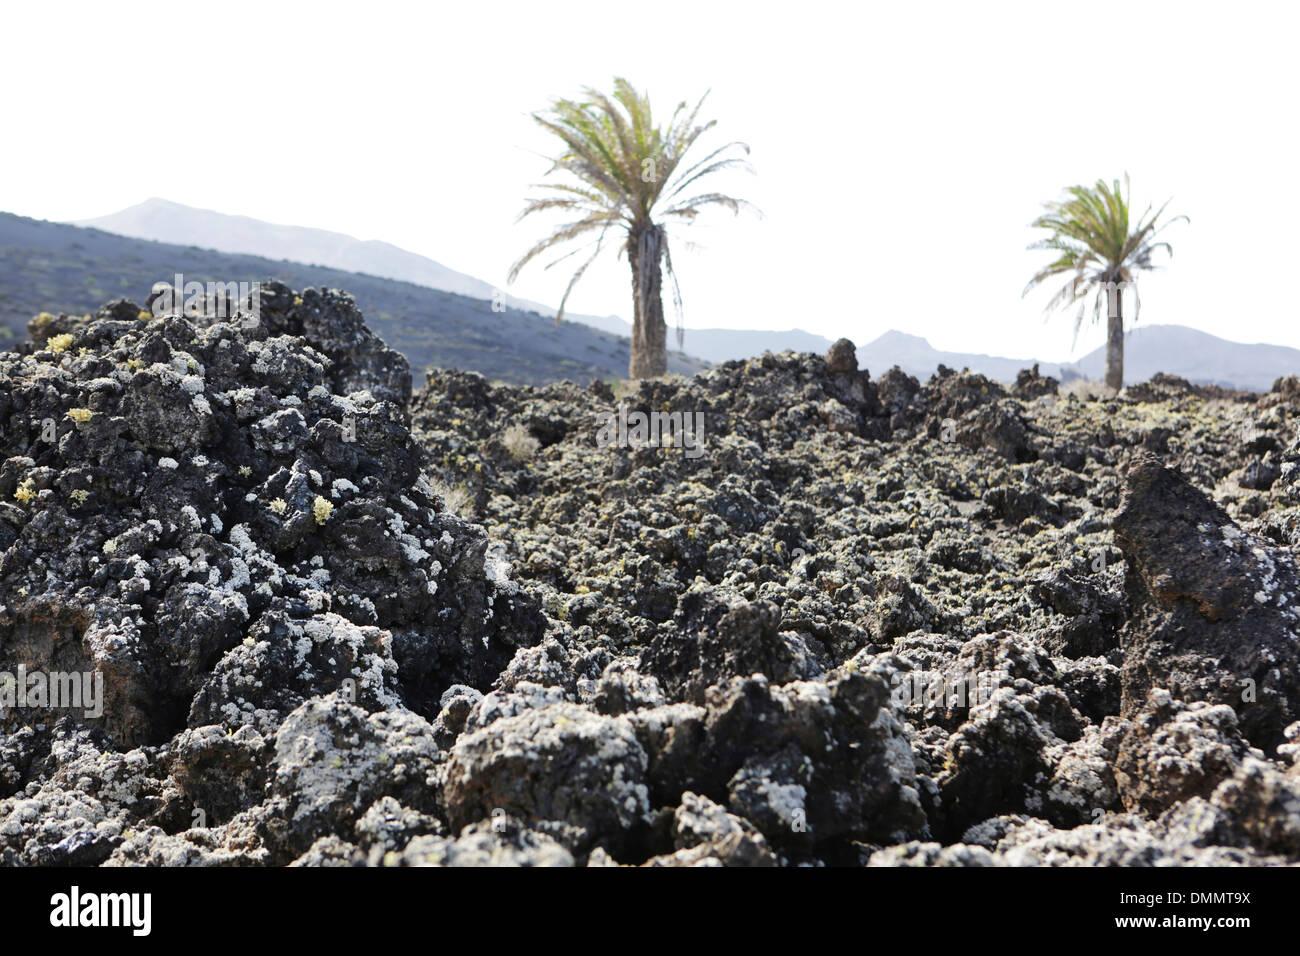 Spain, Lanzarote, Timanfaya National Park, Stock Photo